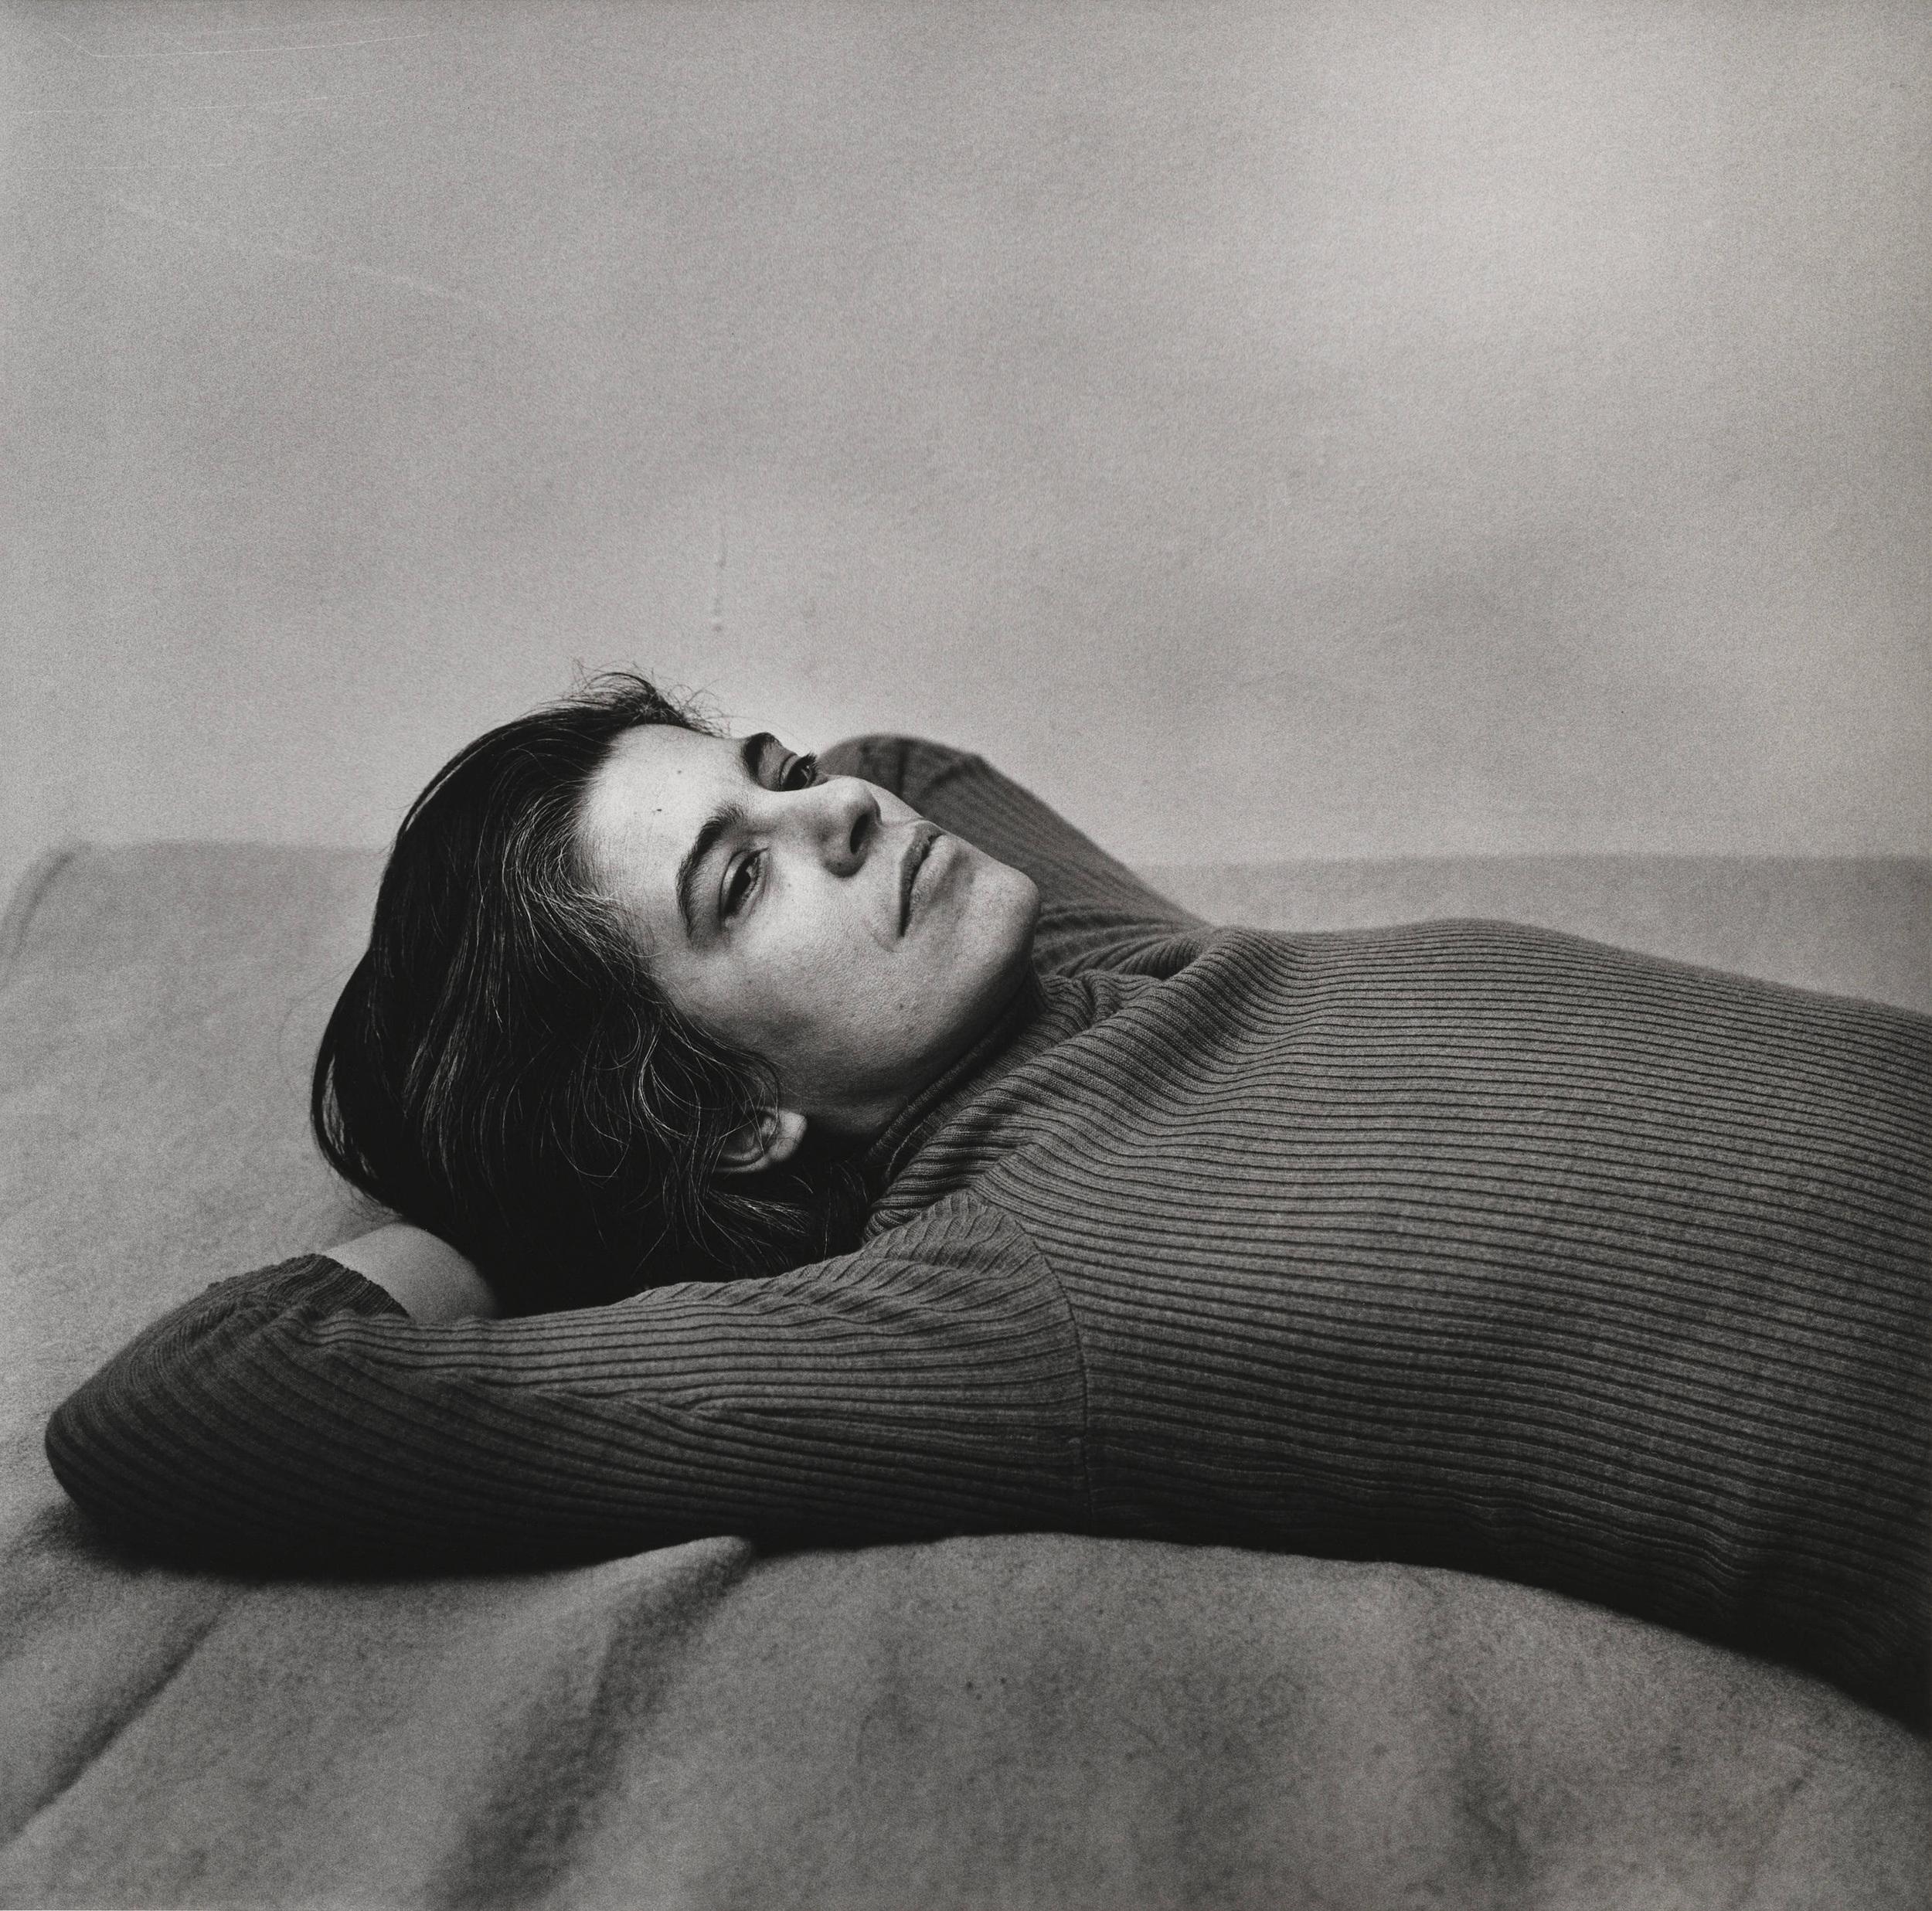 Susan_Sontag-Peter_Hujar-1975.jpg